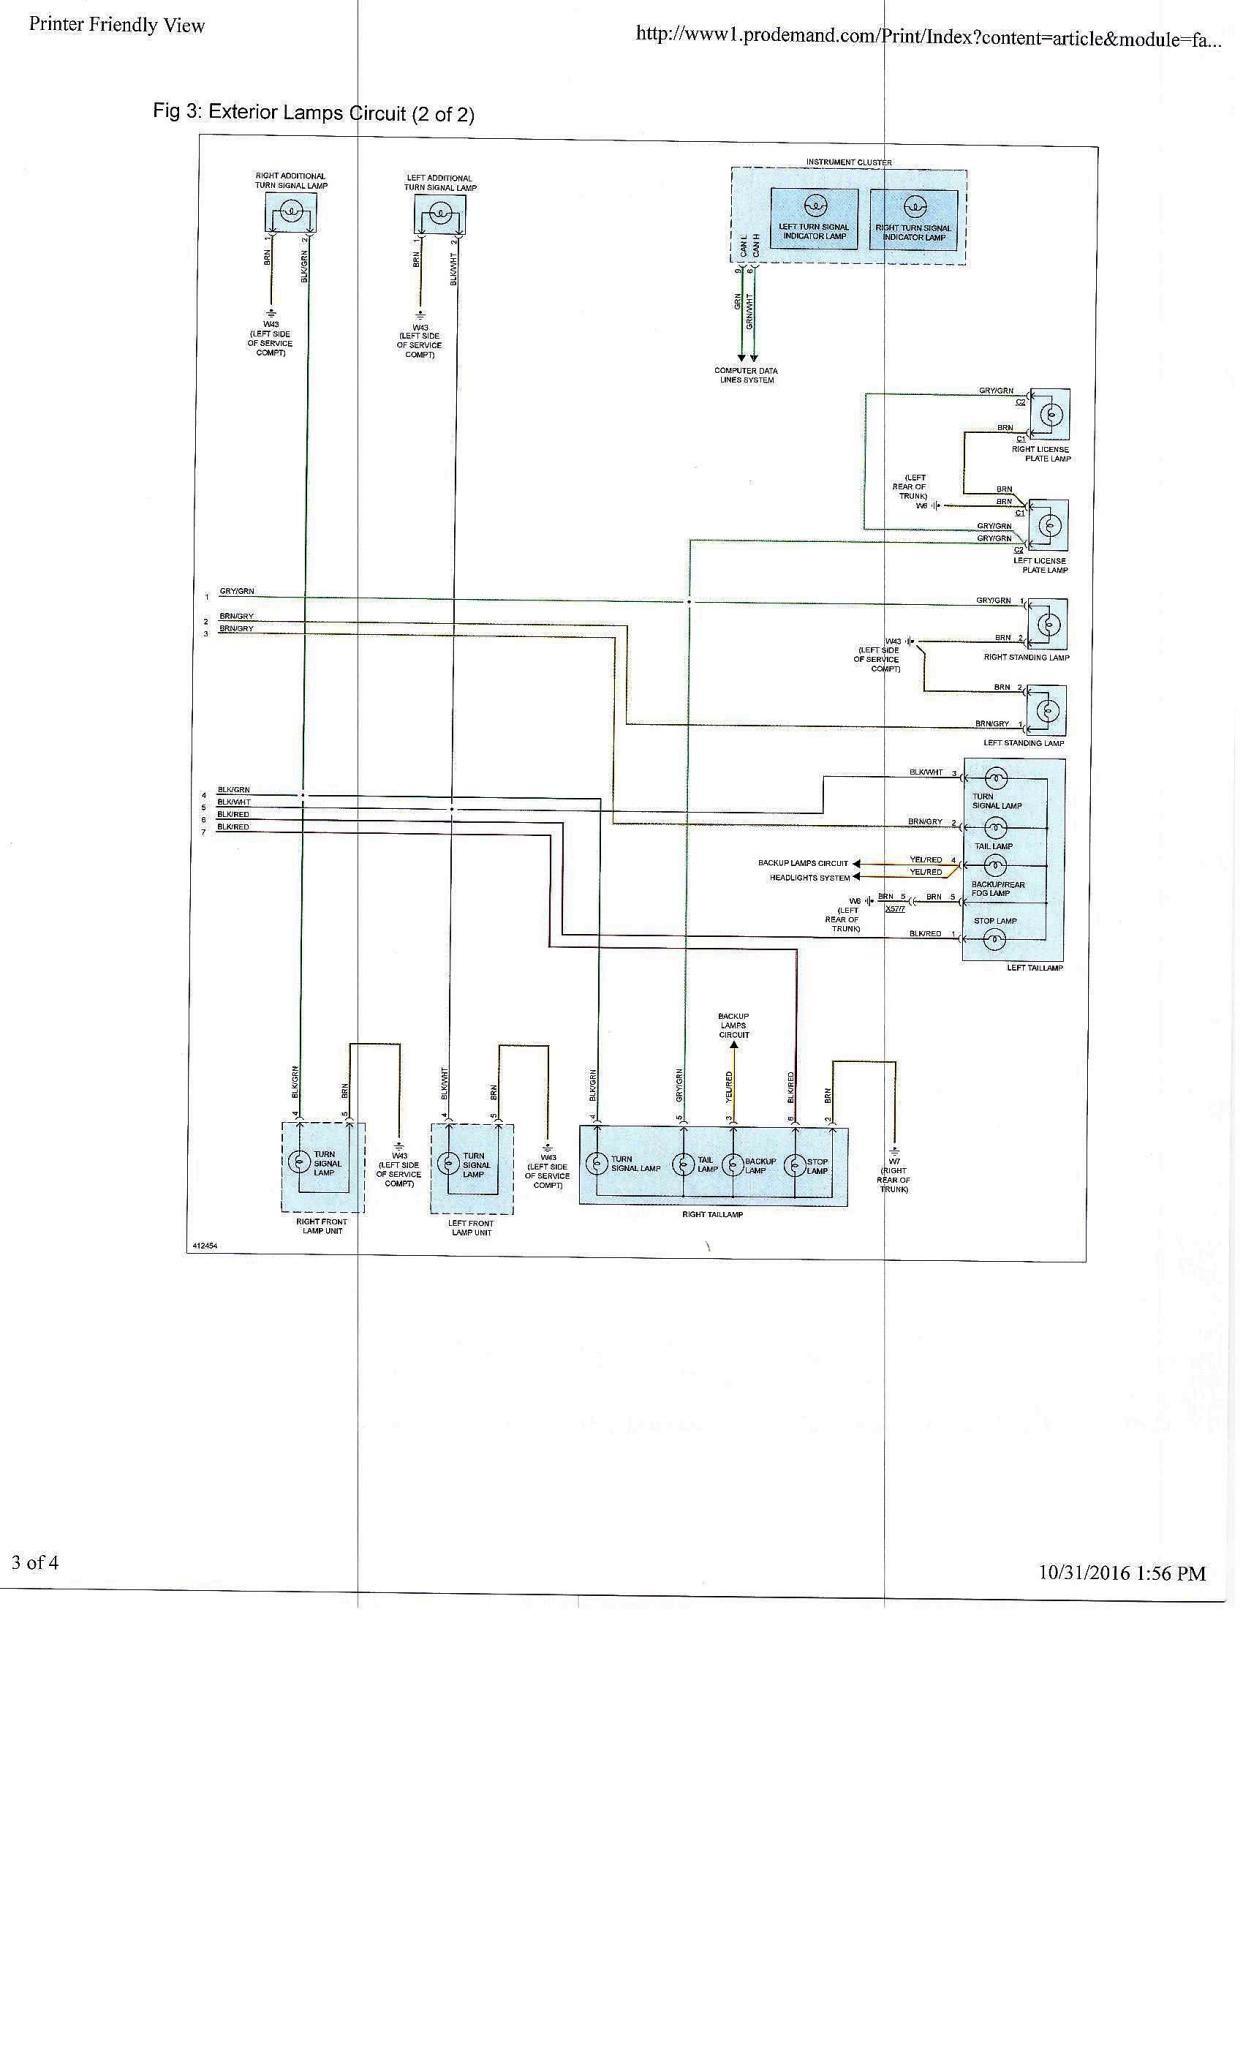 Smart Fortwo Starter Wiring Diagram | Wiring Diagram - Remote Car Starter Wiring Diagram